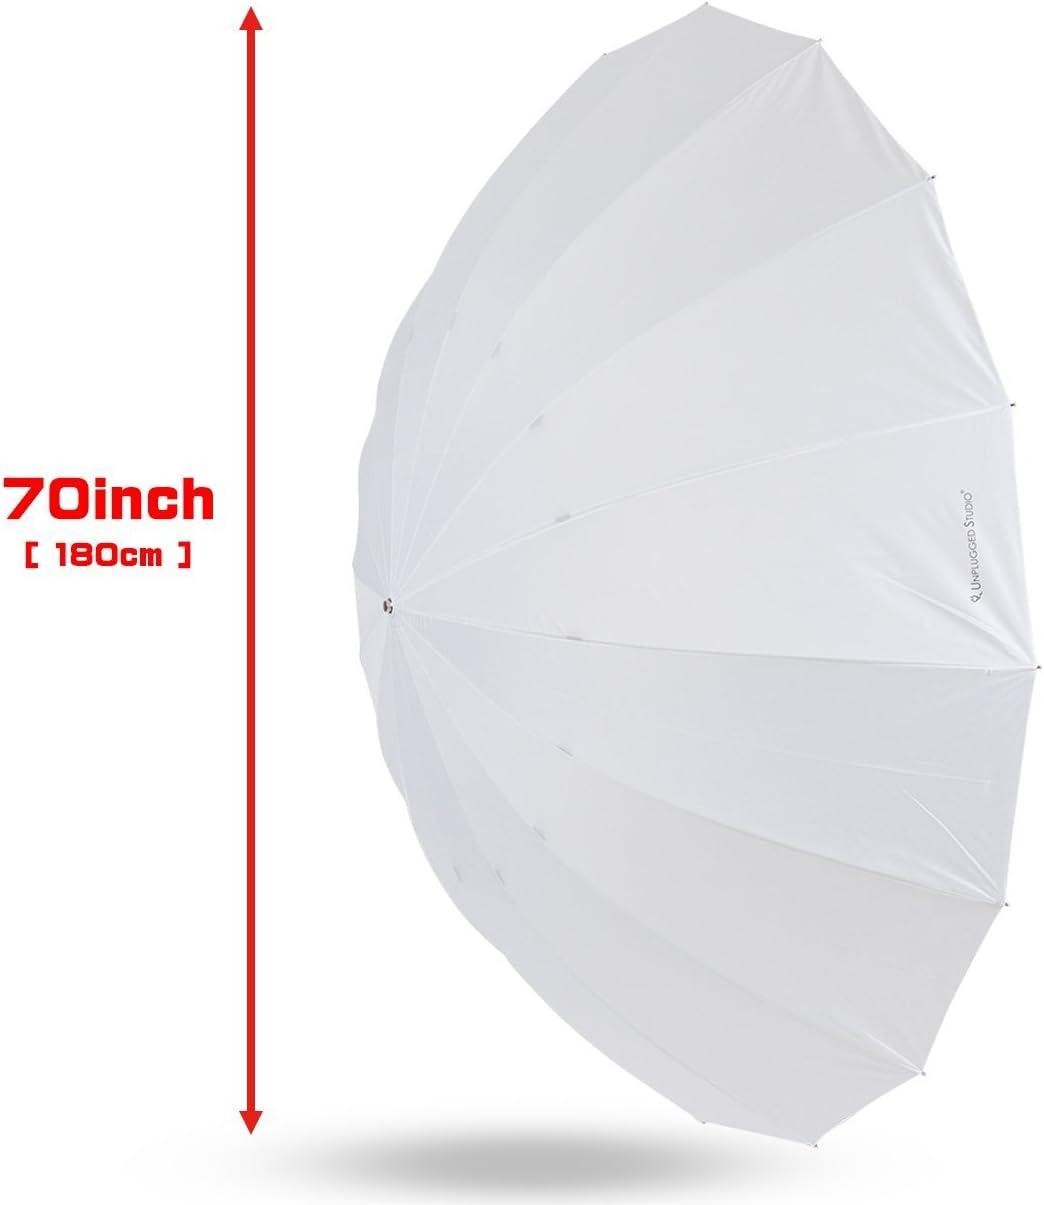 16 Fiberglass Ribs UN-024 UNPLUGGED STUDIO 60inch Translucent Umbrella